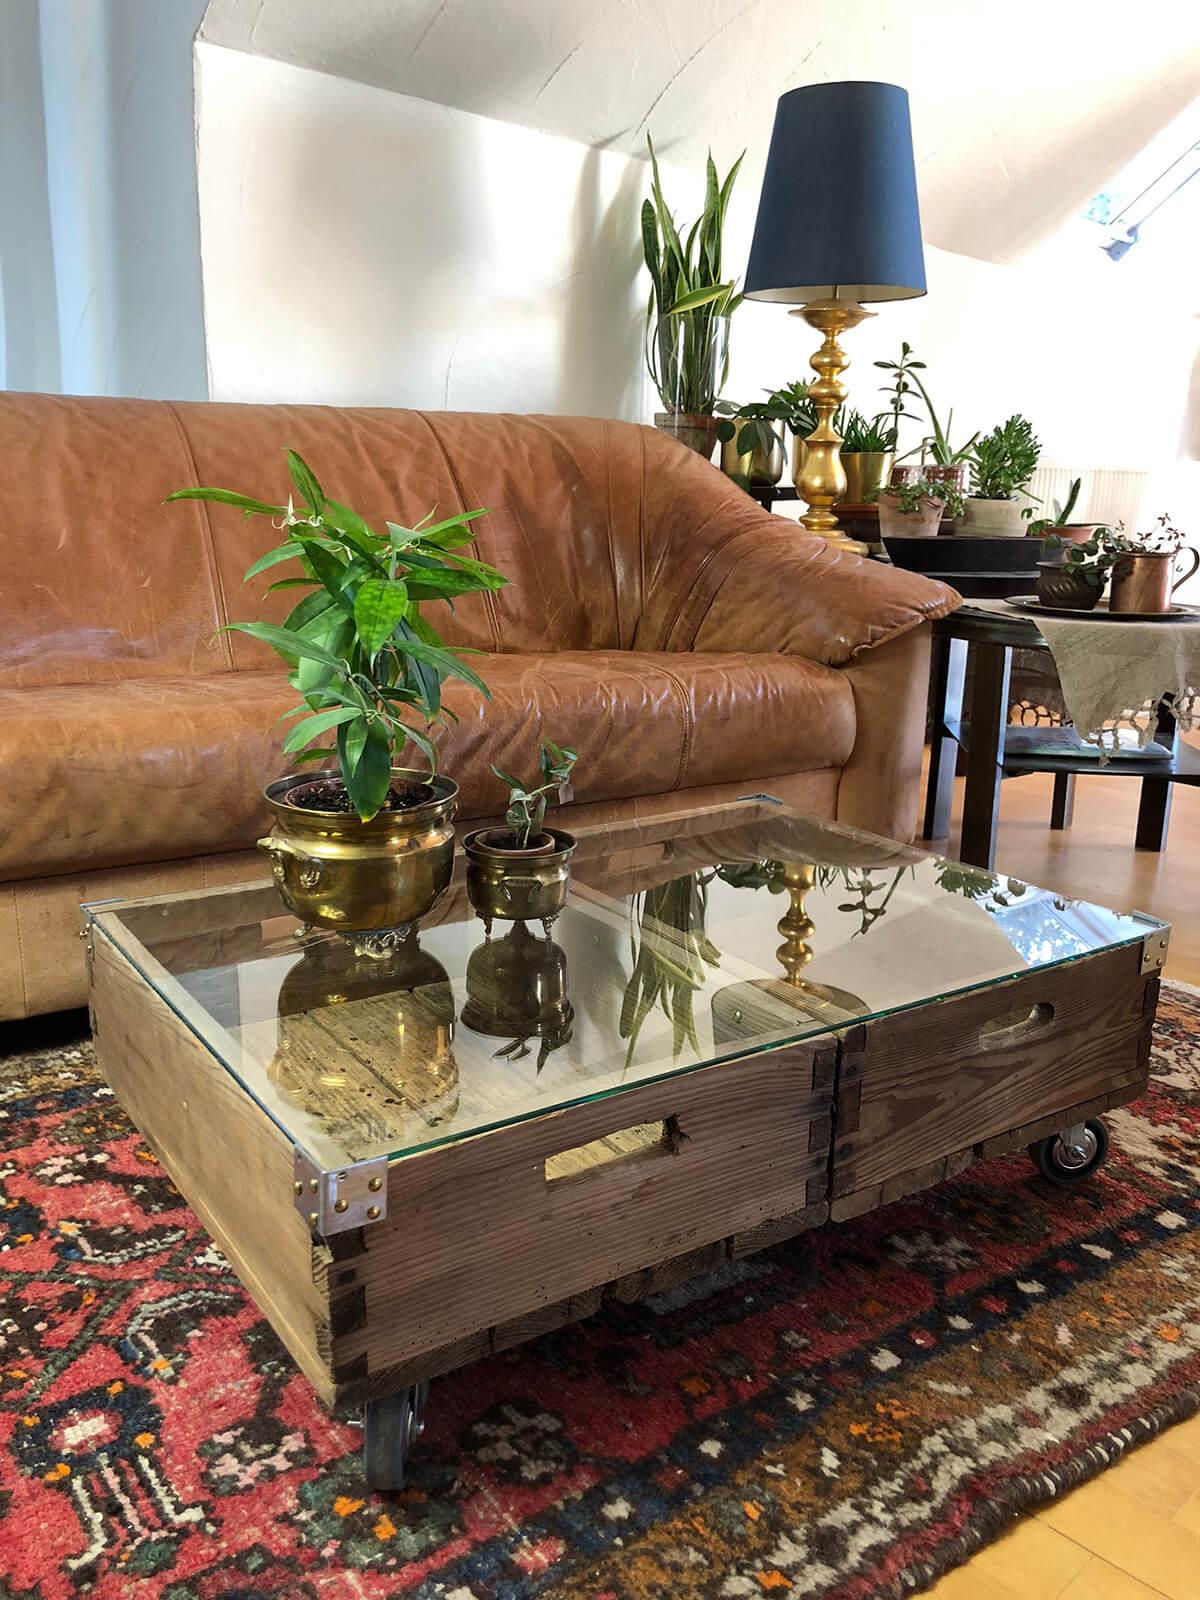 Unique Wooden Drawers for Maximum Storage